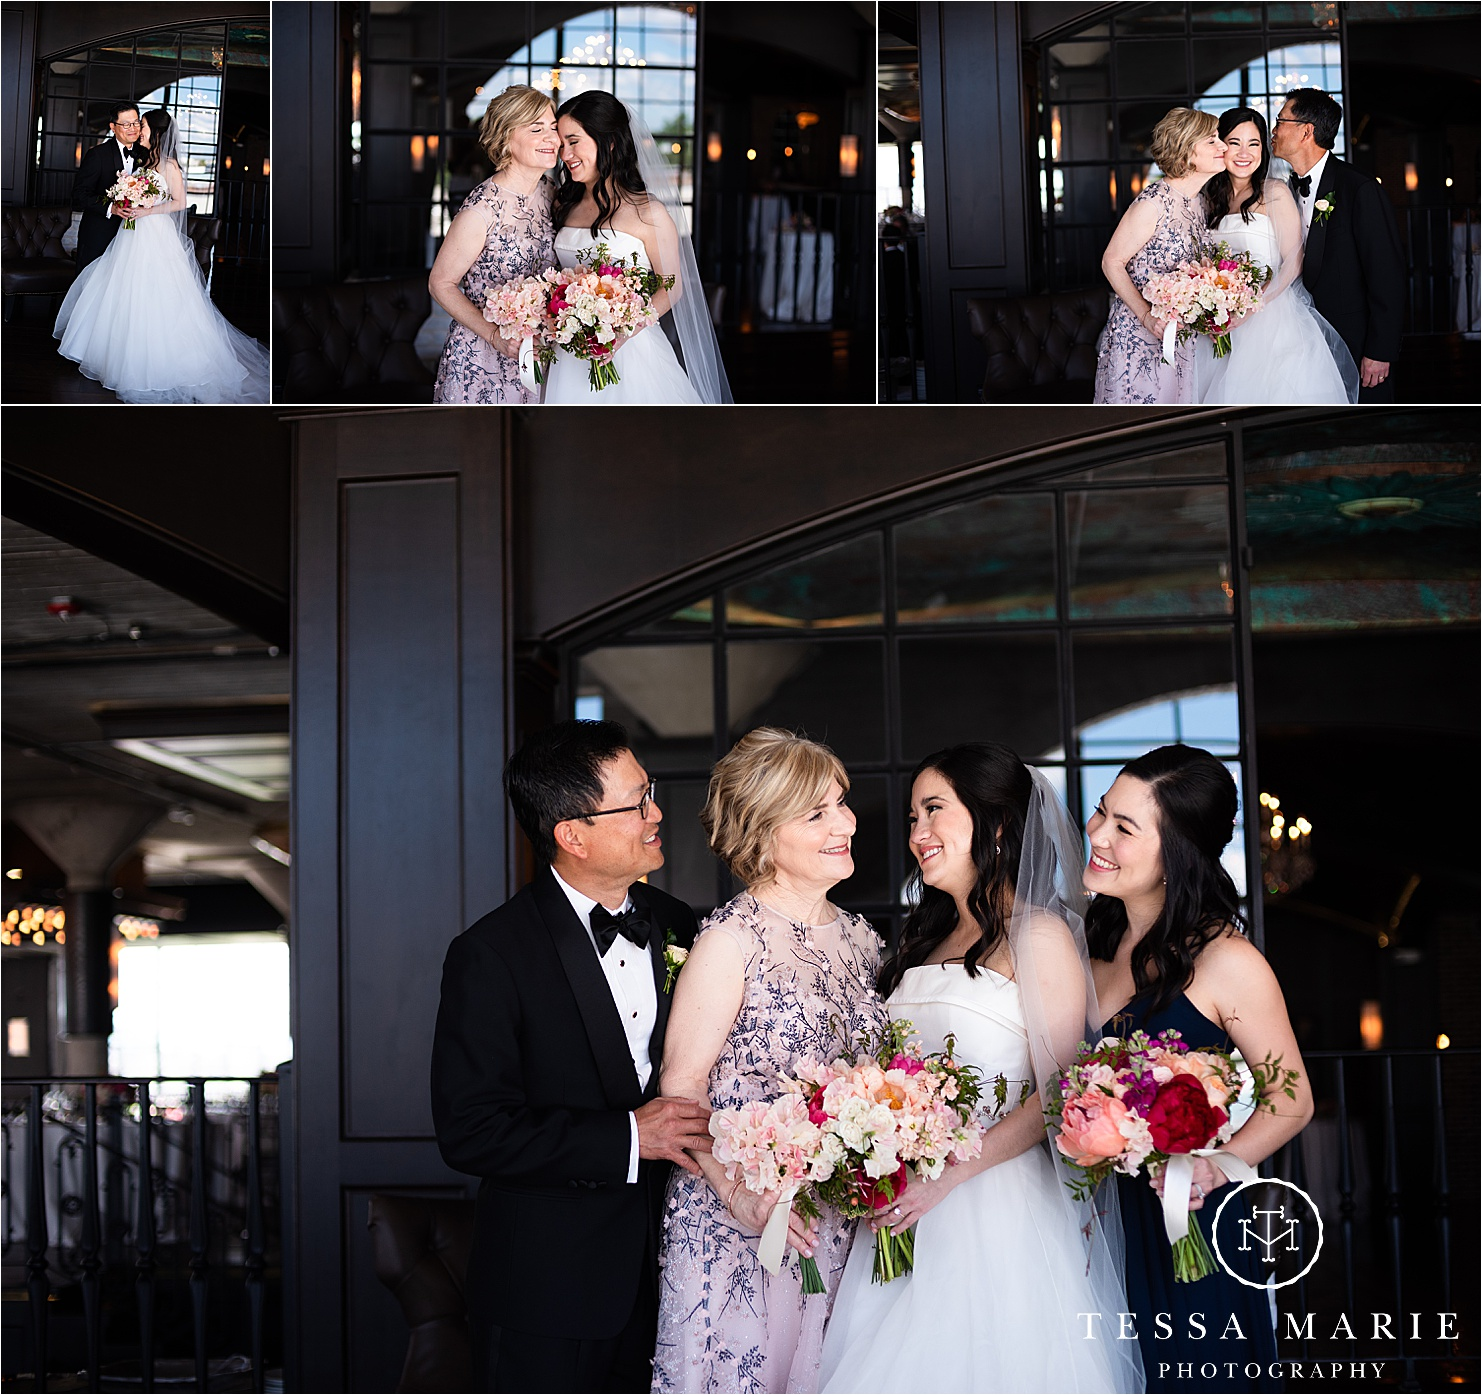 Tessa_marie_weddings_houston_wedding_photographer_The_astorian_0094.jpg